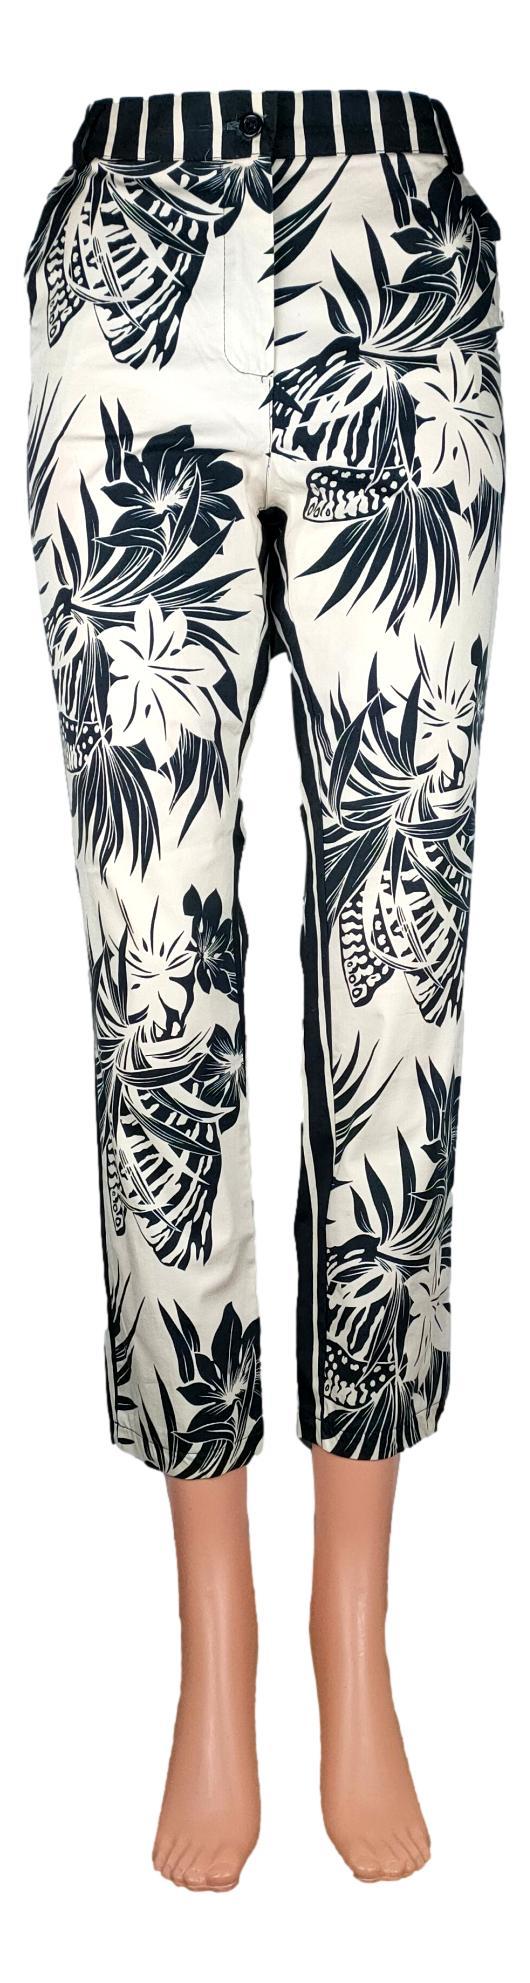 Pantalon Coconuda - Taille 40